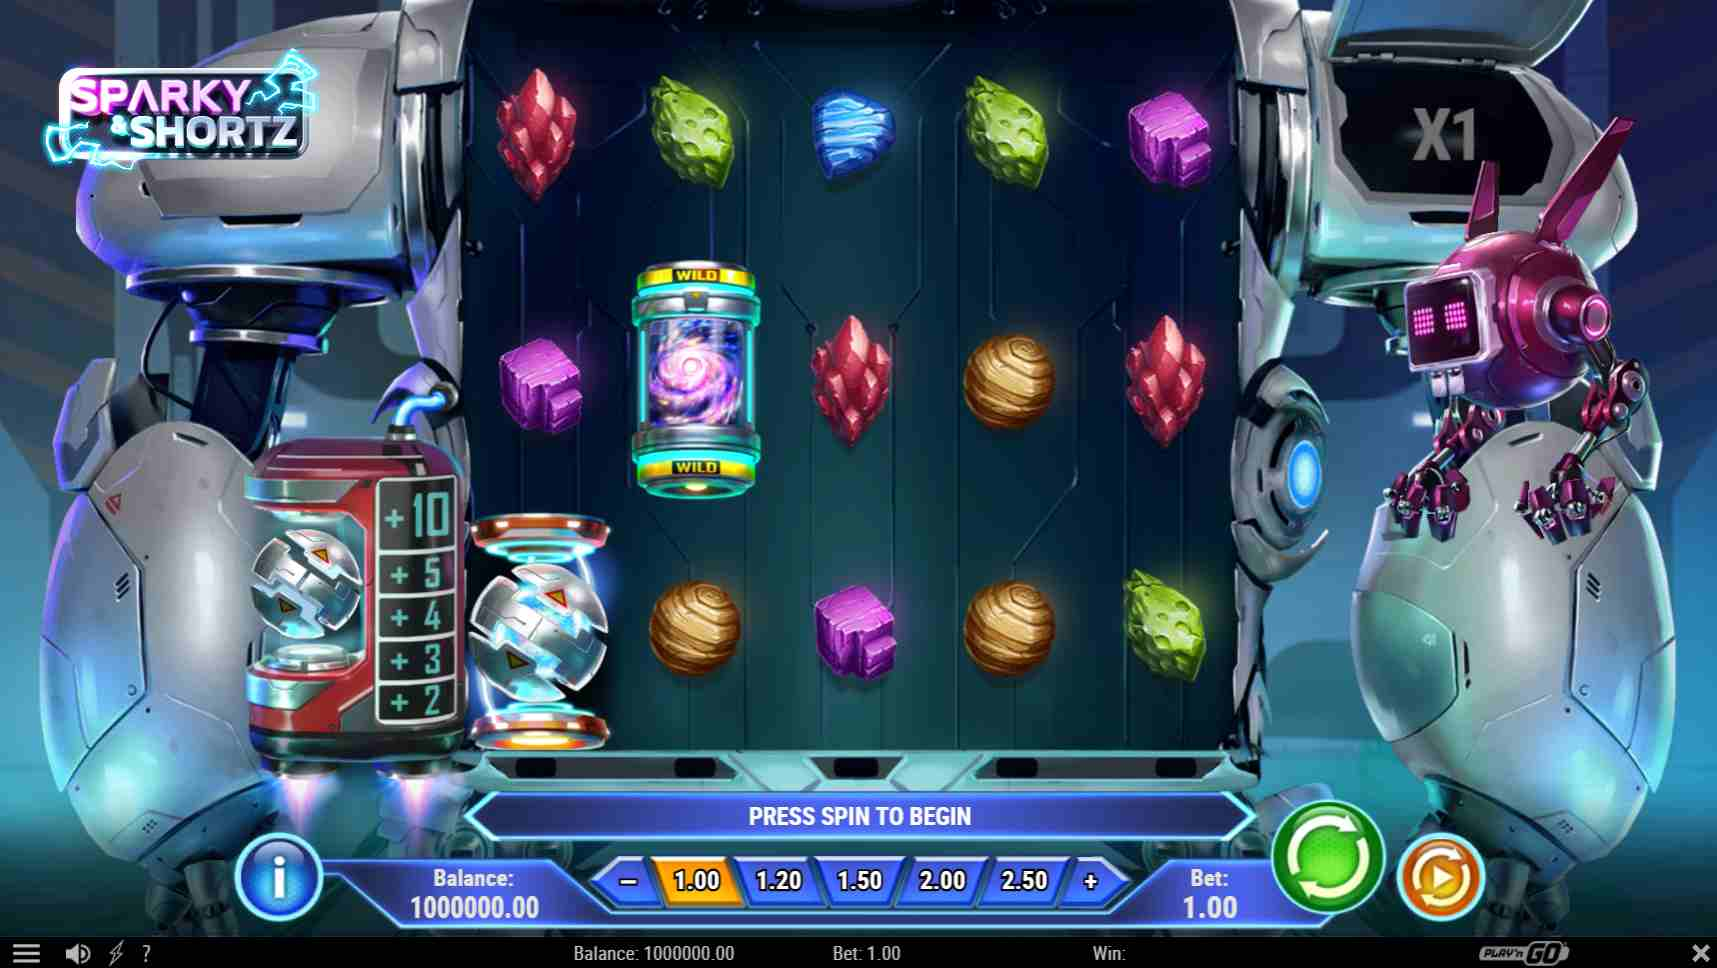 Sparky & Shortz Base Game